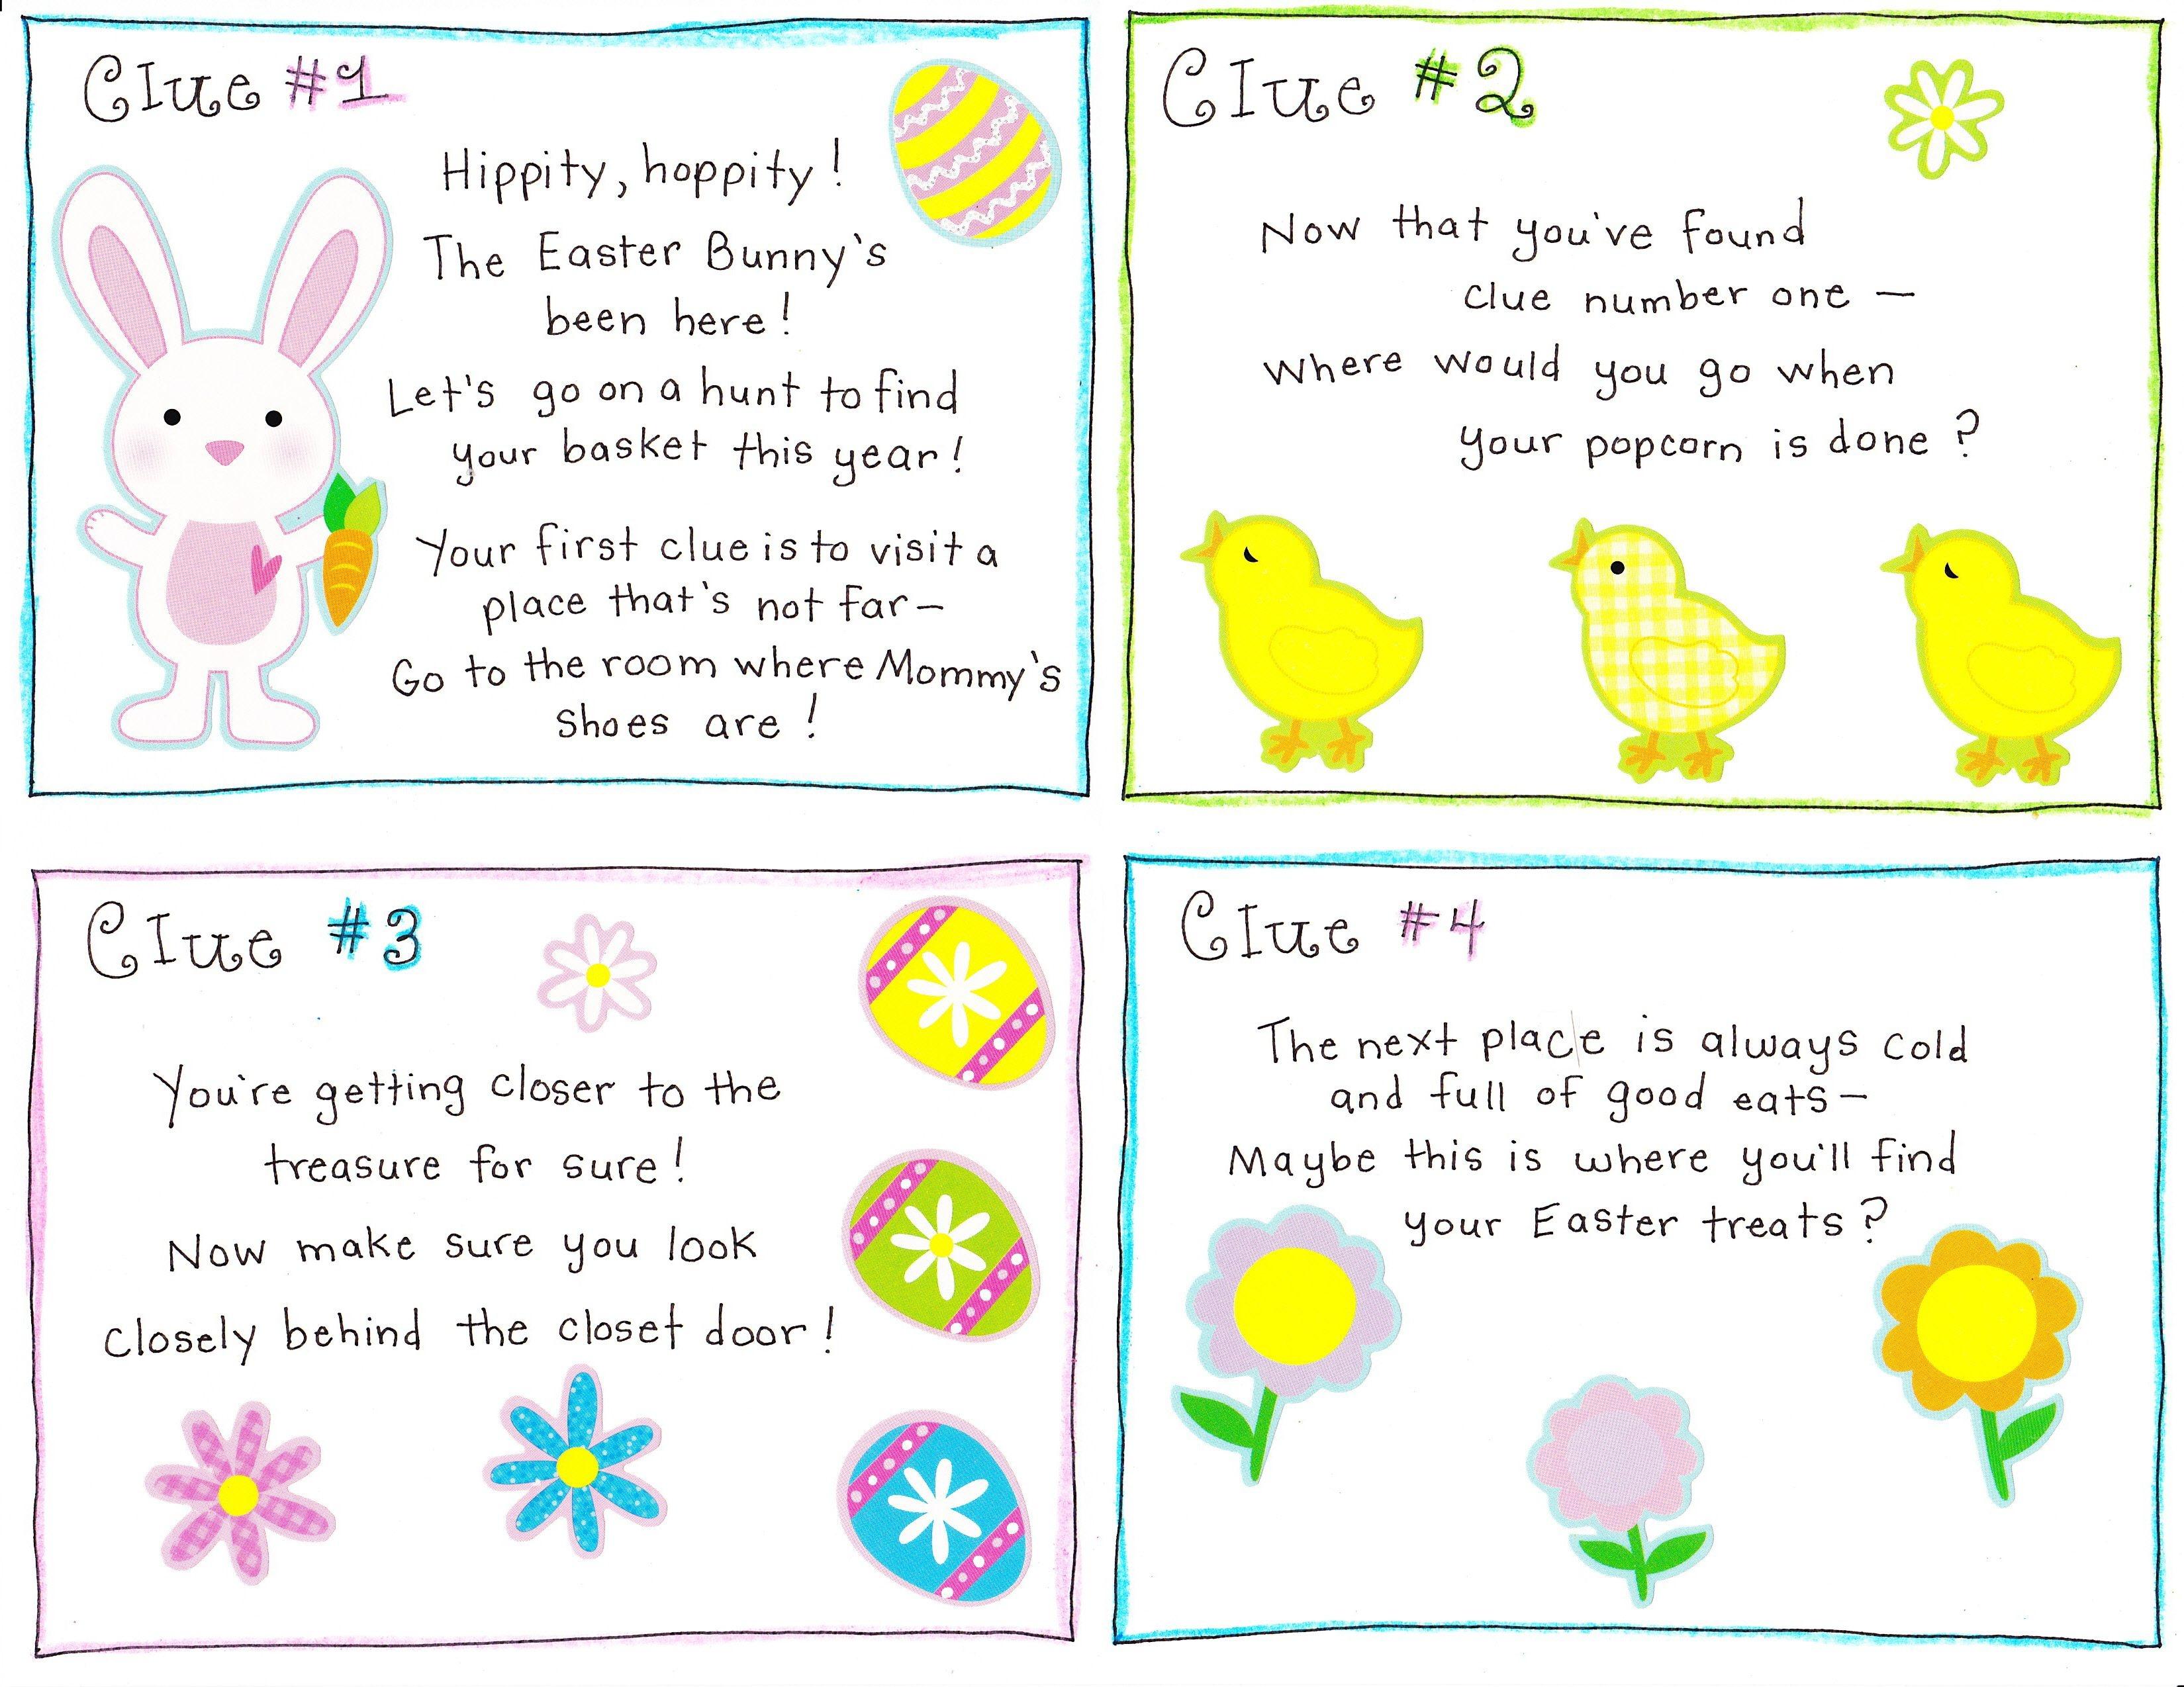 Easter Morning Scavenger Hunt - Free Printable   Easter   Easter - Free Printable Easter Egg Hunt Riddles